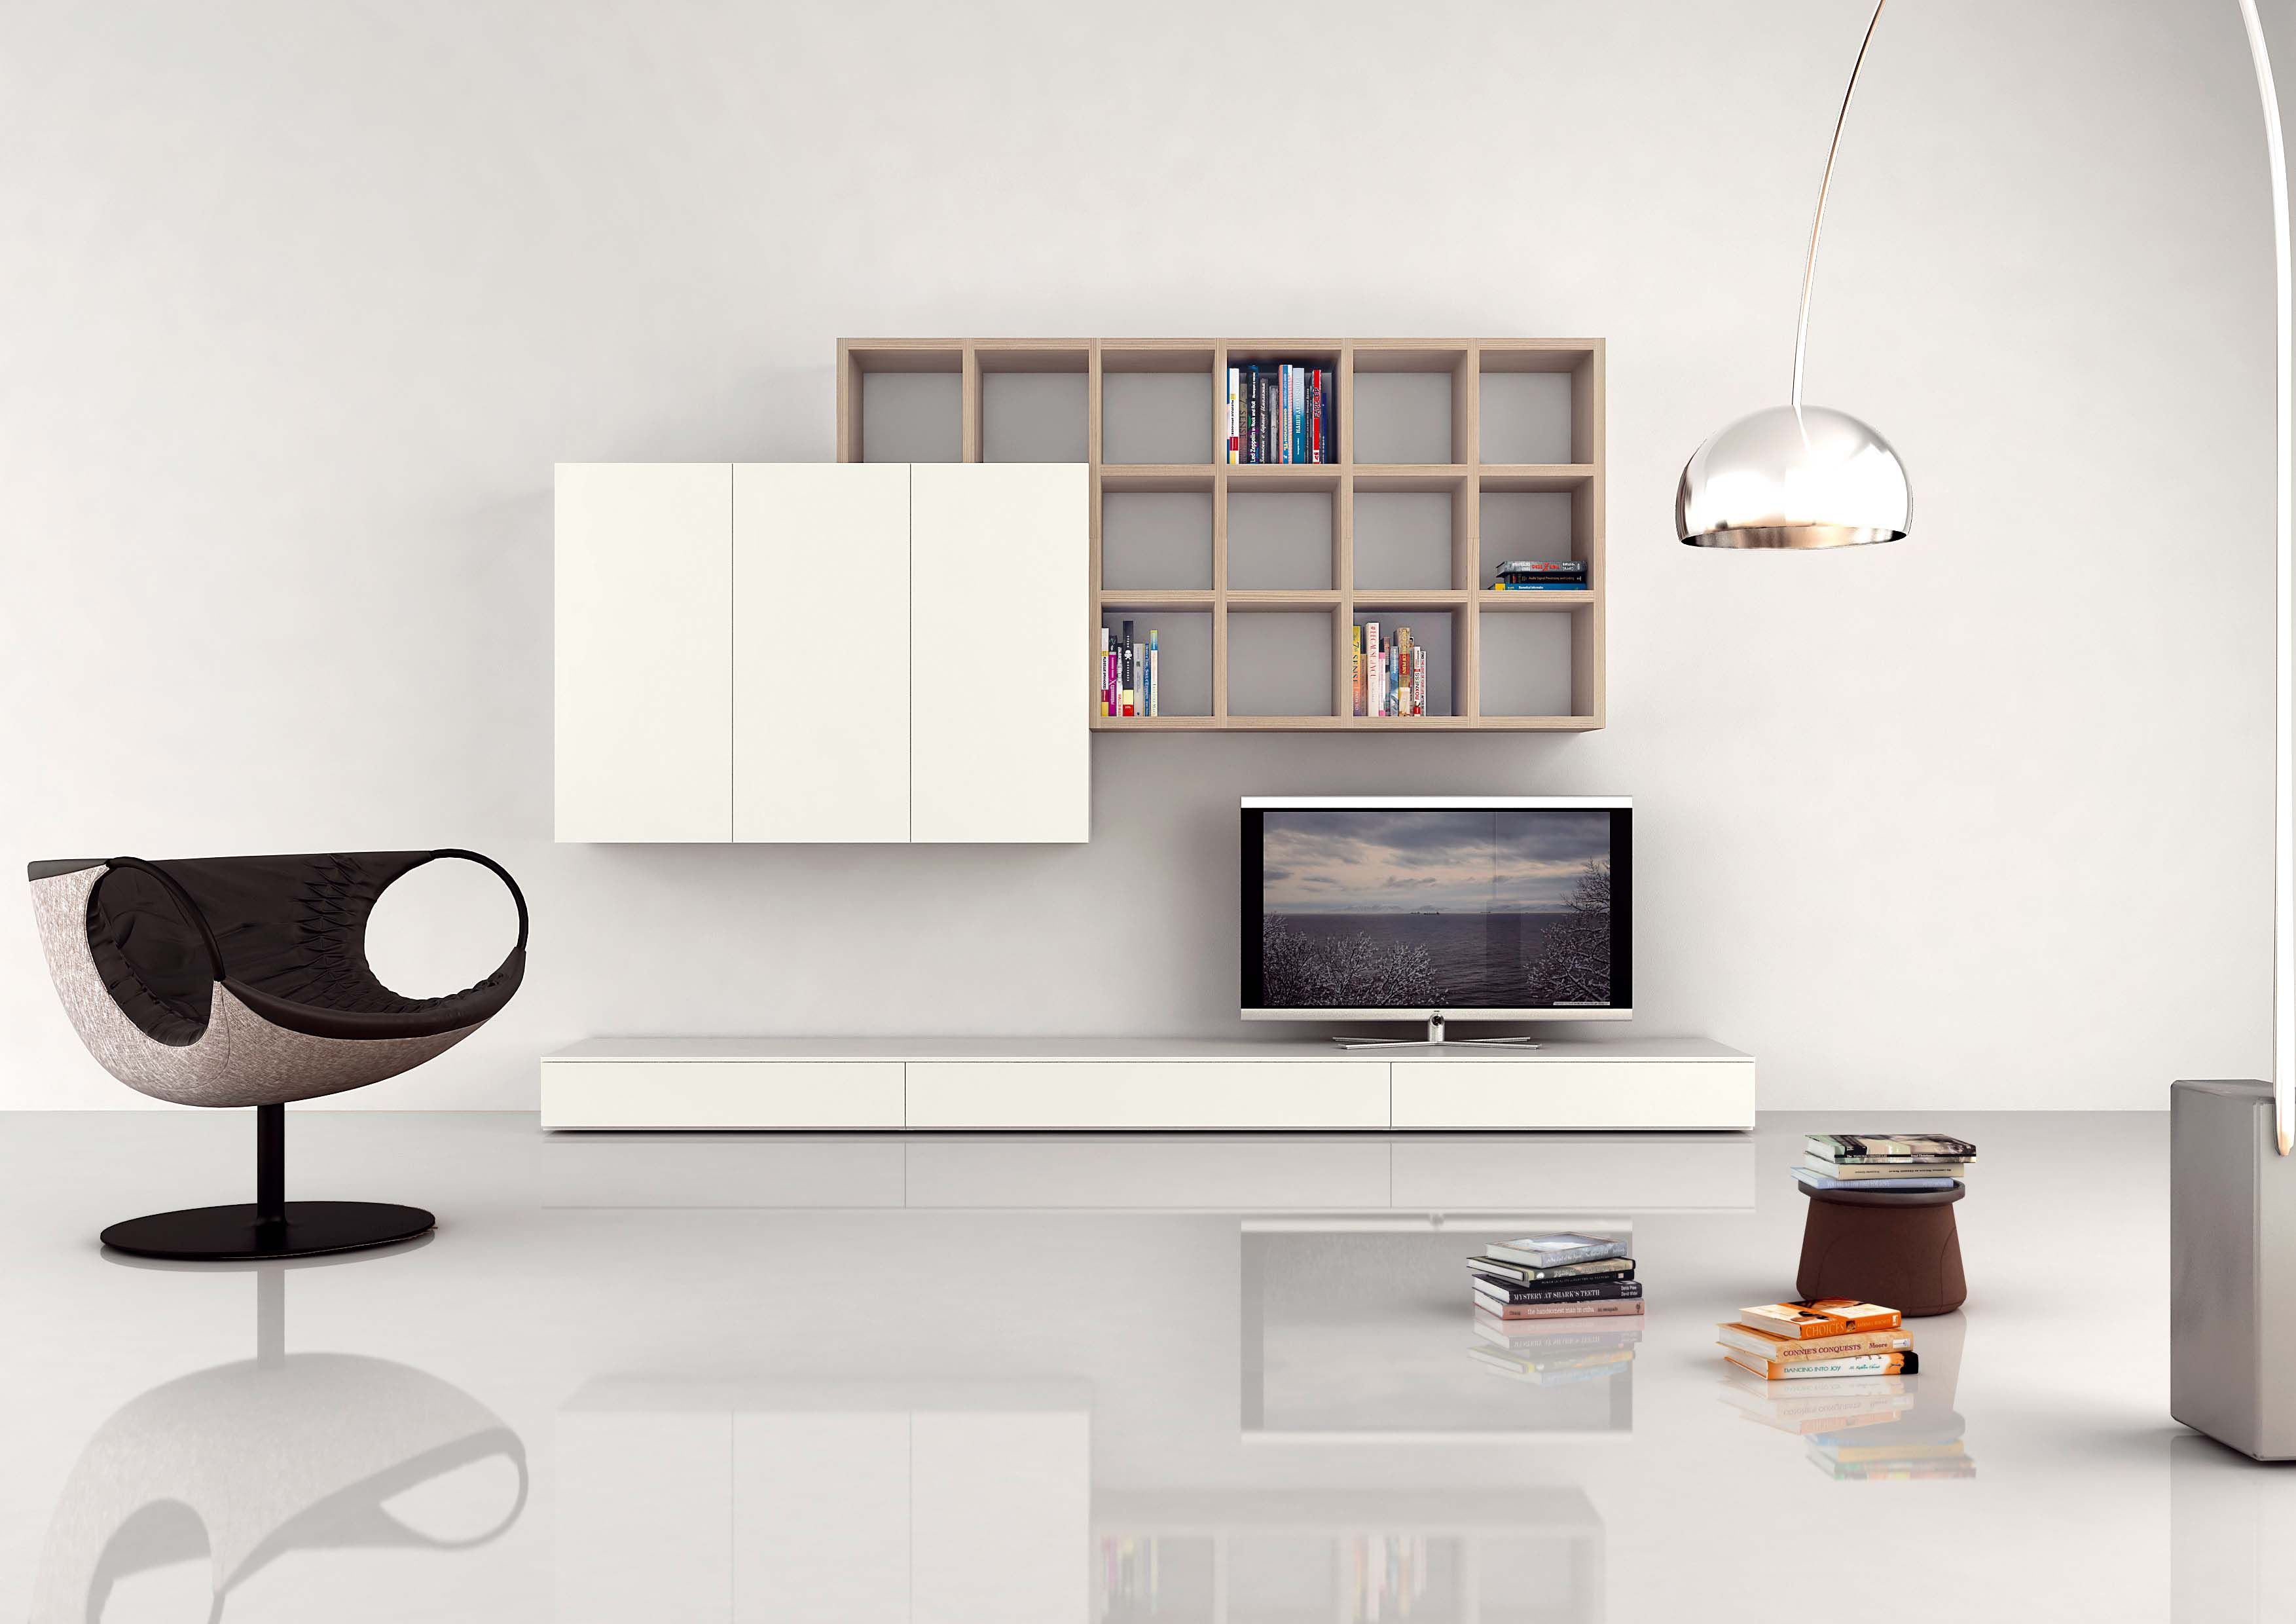 Moderne Wohnzimmer | Wohnzimmer Modern Wohnzimmer Im Modernen Stil